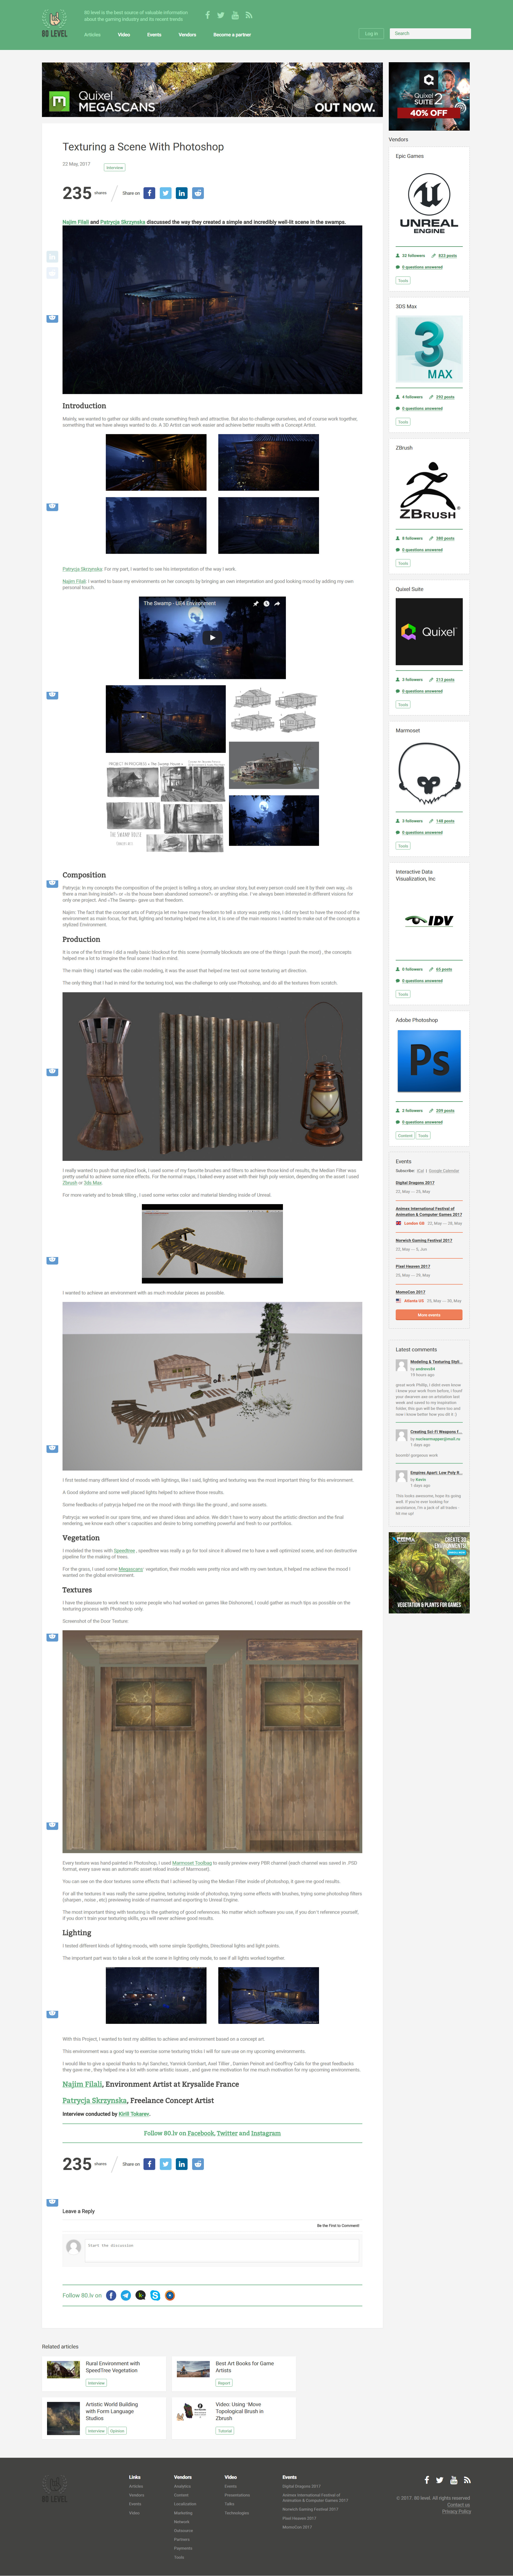 Najim filali saksak screencapture 80 lv articles texturing a scene with photoshop 1495621895947